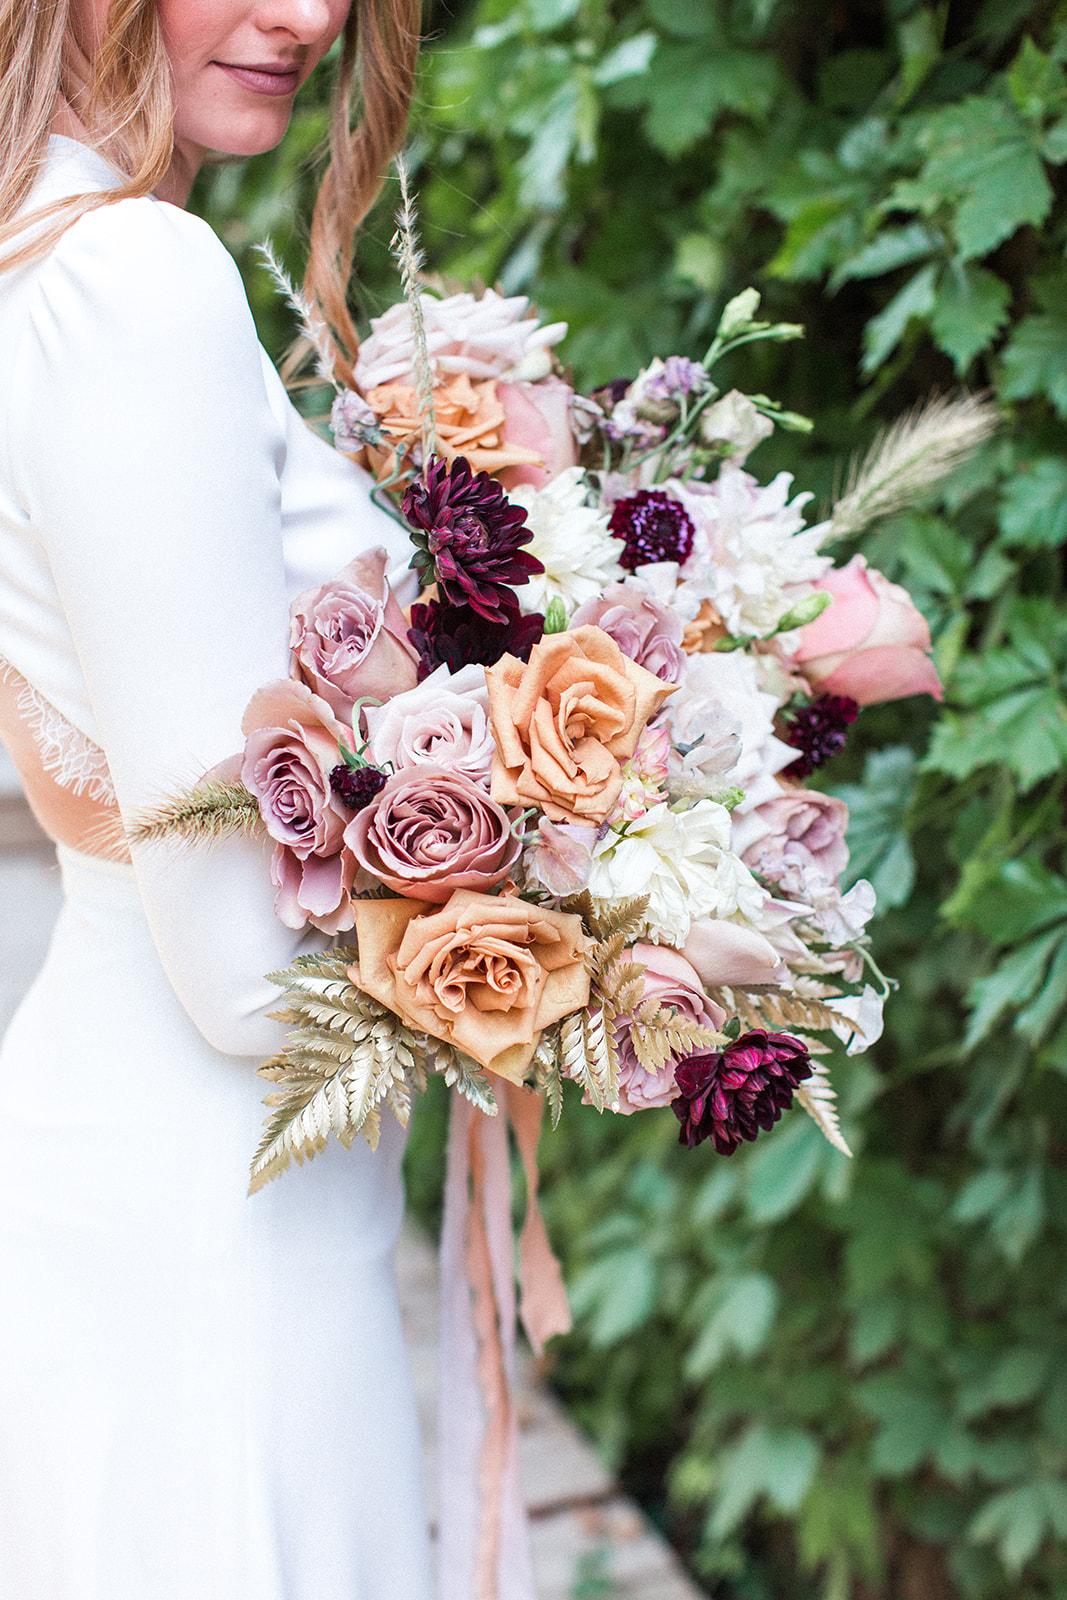 Fall wedding bouquet: Fall Garden Wedding featured on Alexa Kay Events